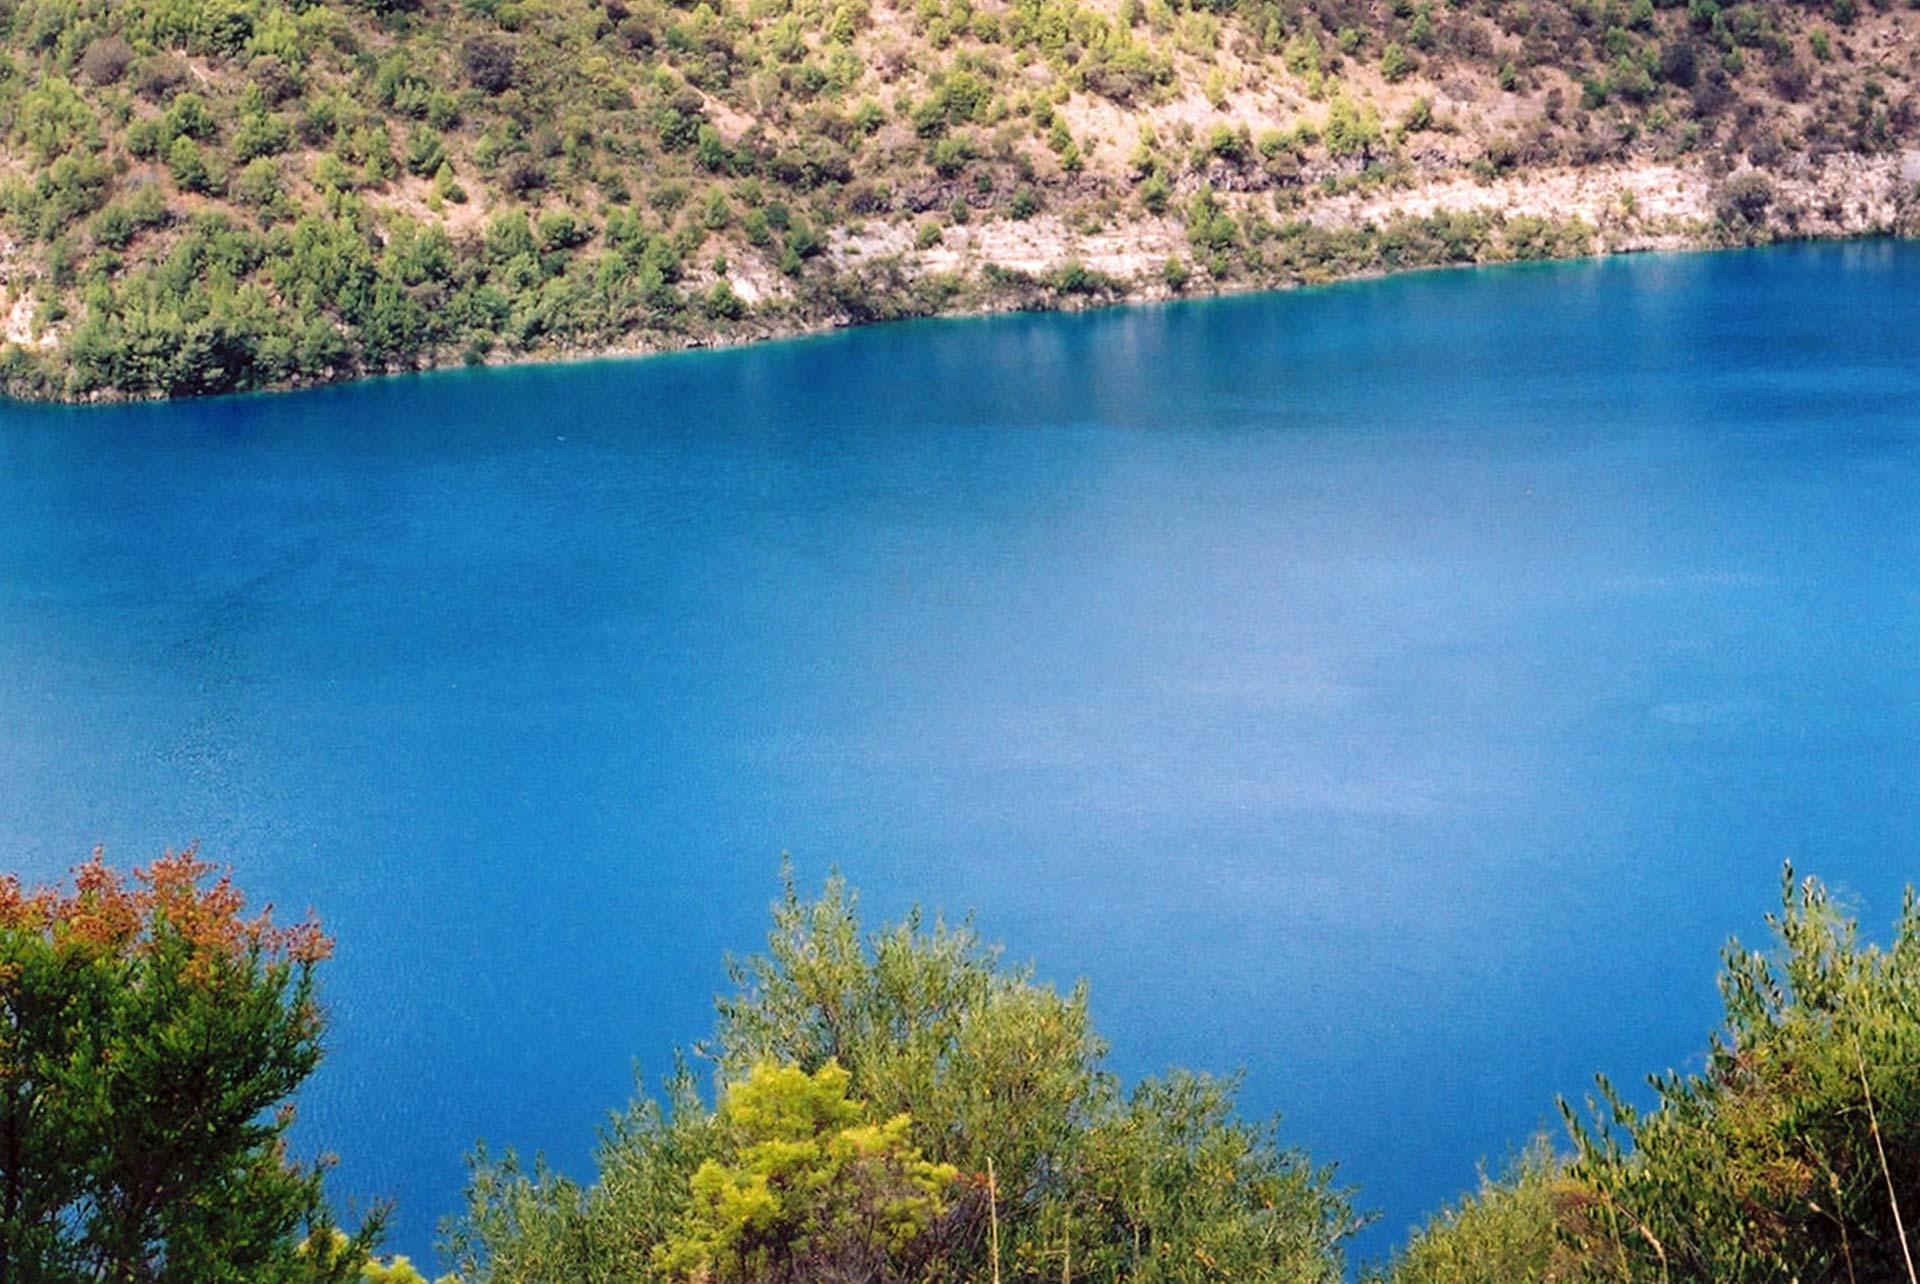 Blue Lake - Hawkins Booroopki Farms, Minimay and West Wimmera Region